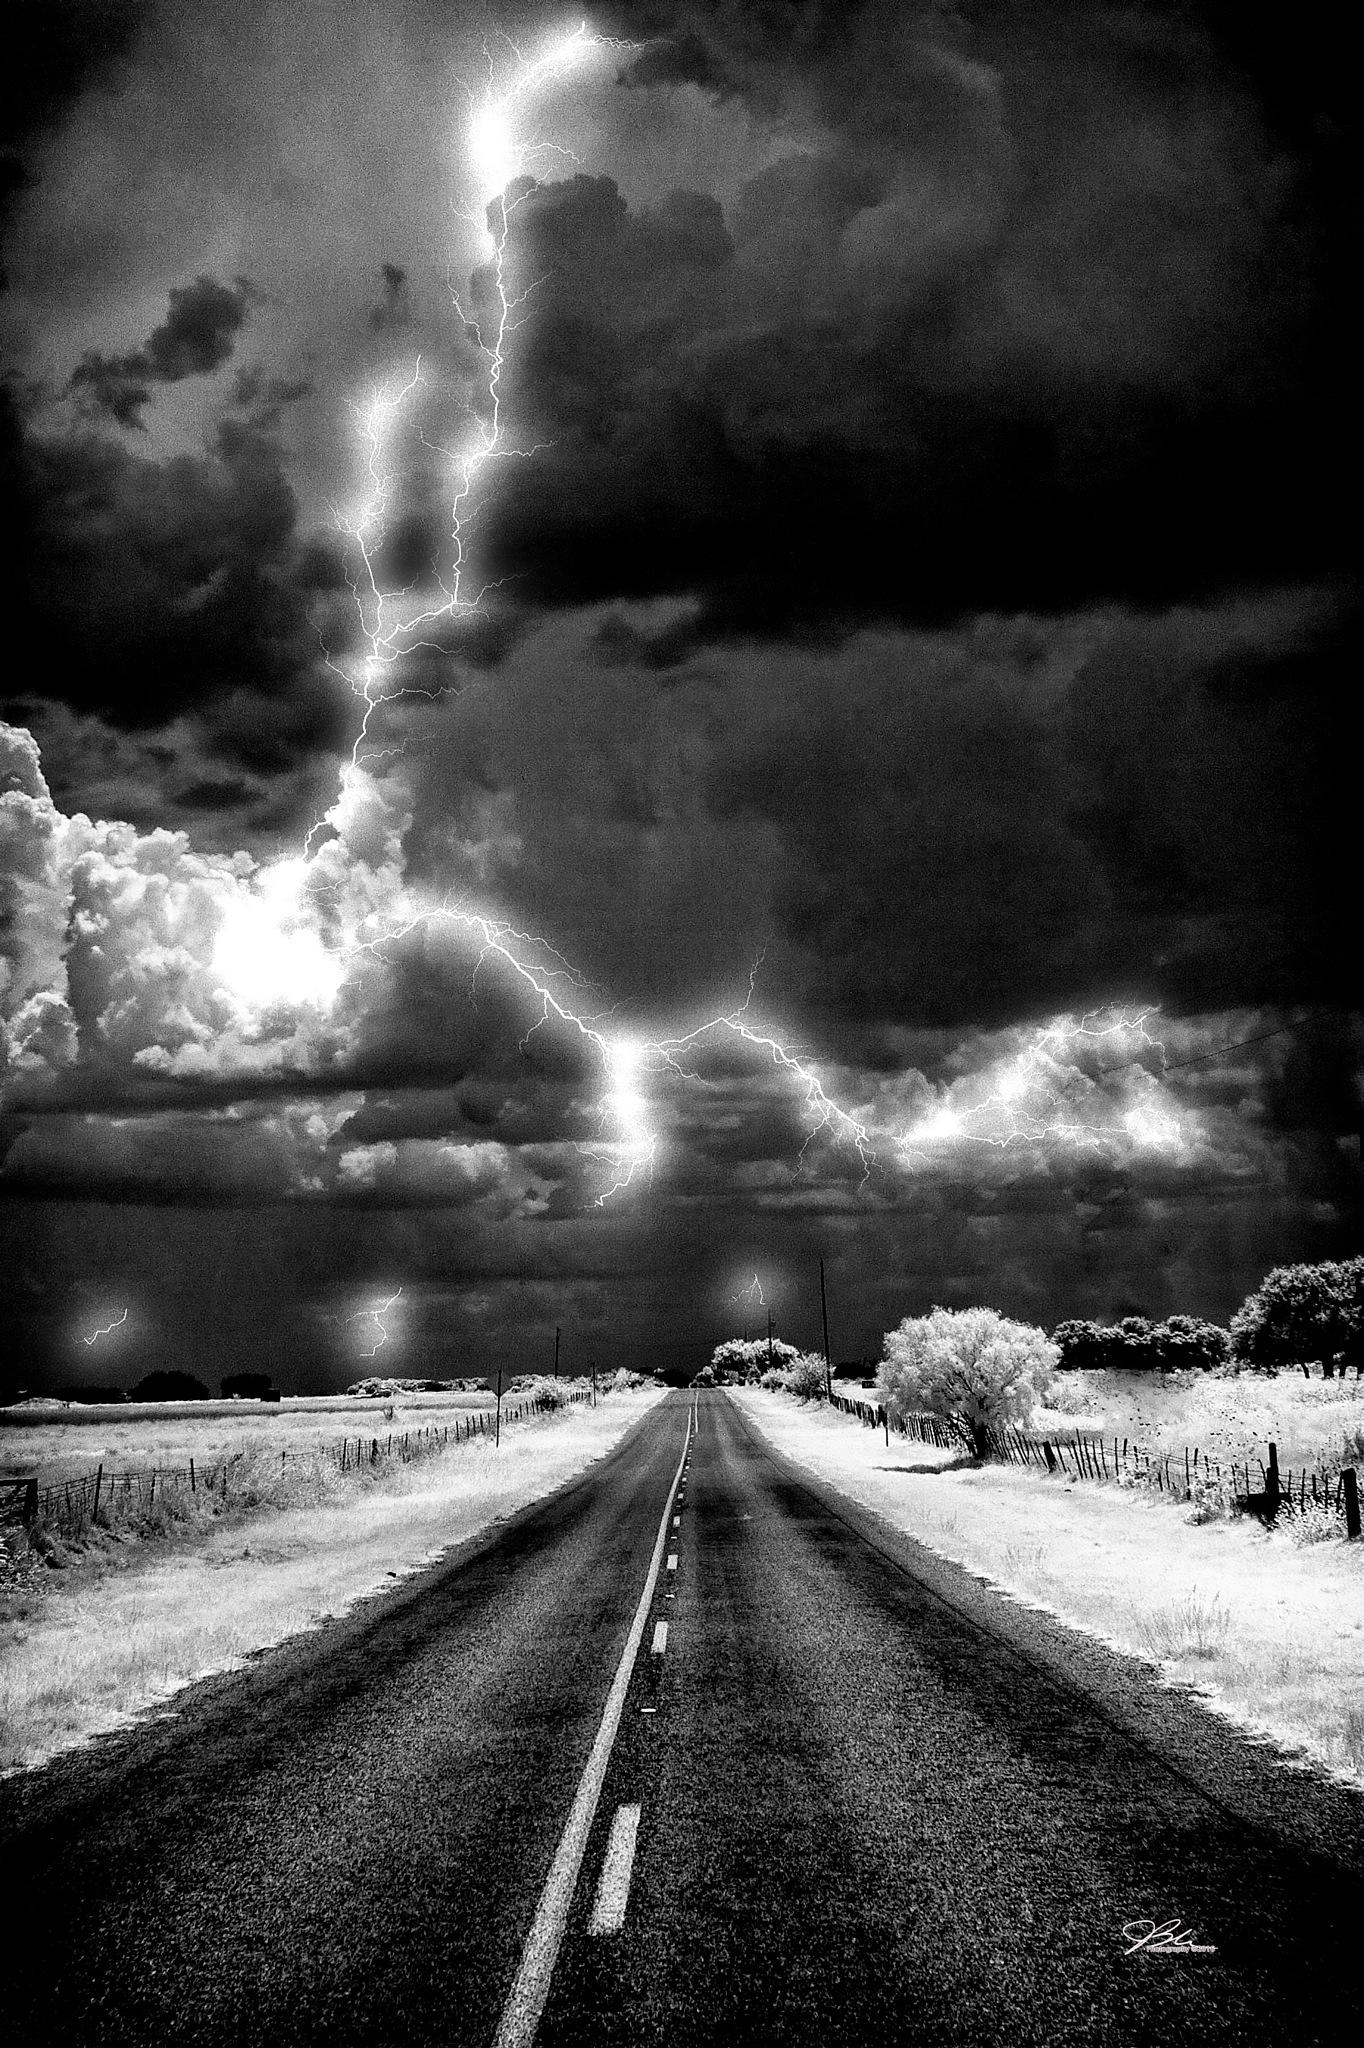 Electric Sky_1 by jblakephotos